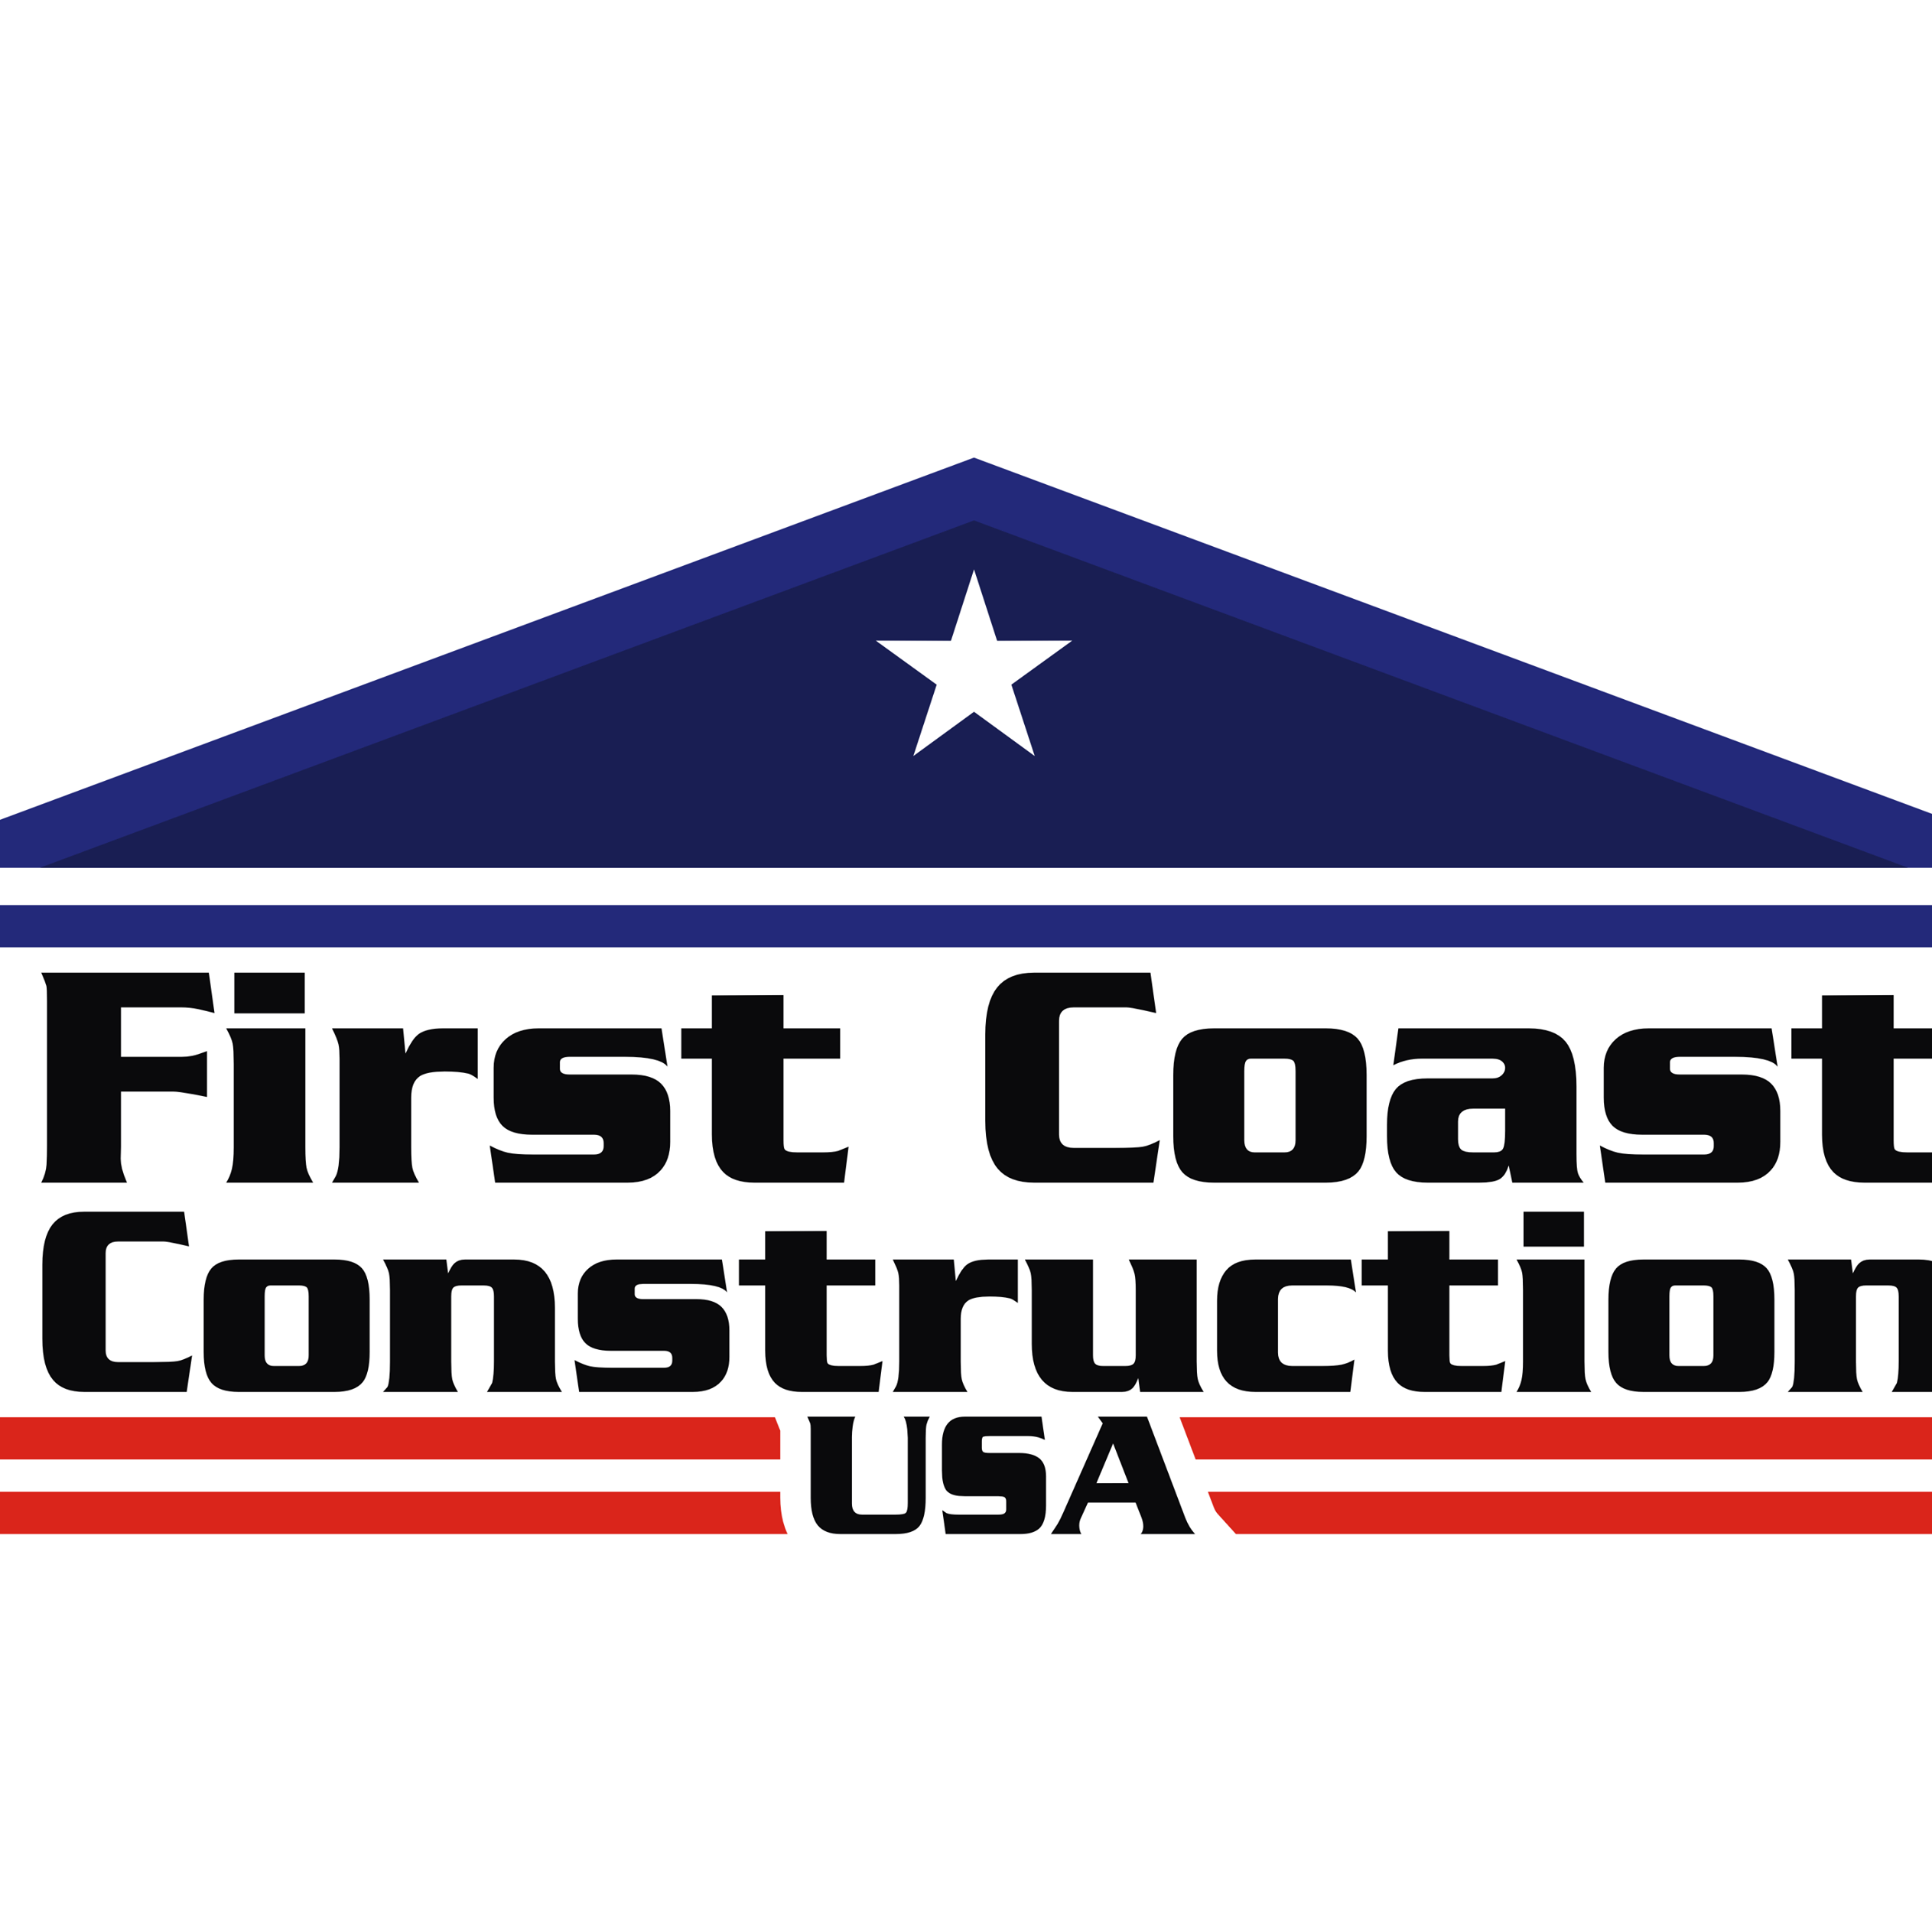 First Coast Construction USA, Inc.